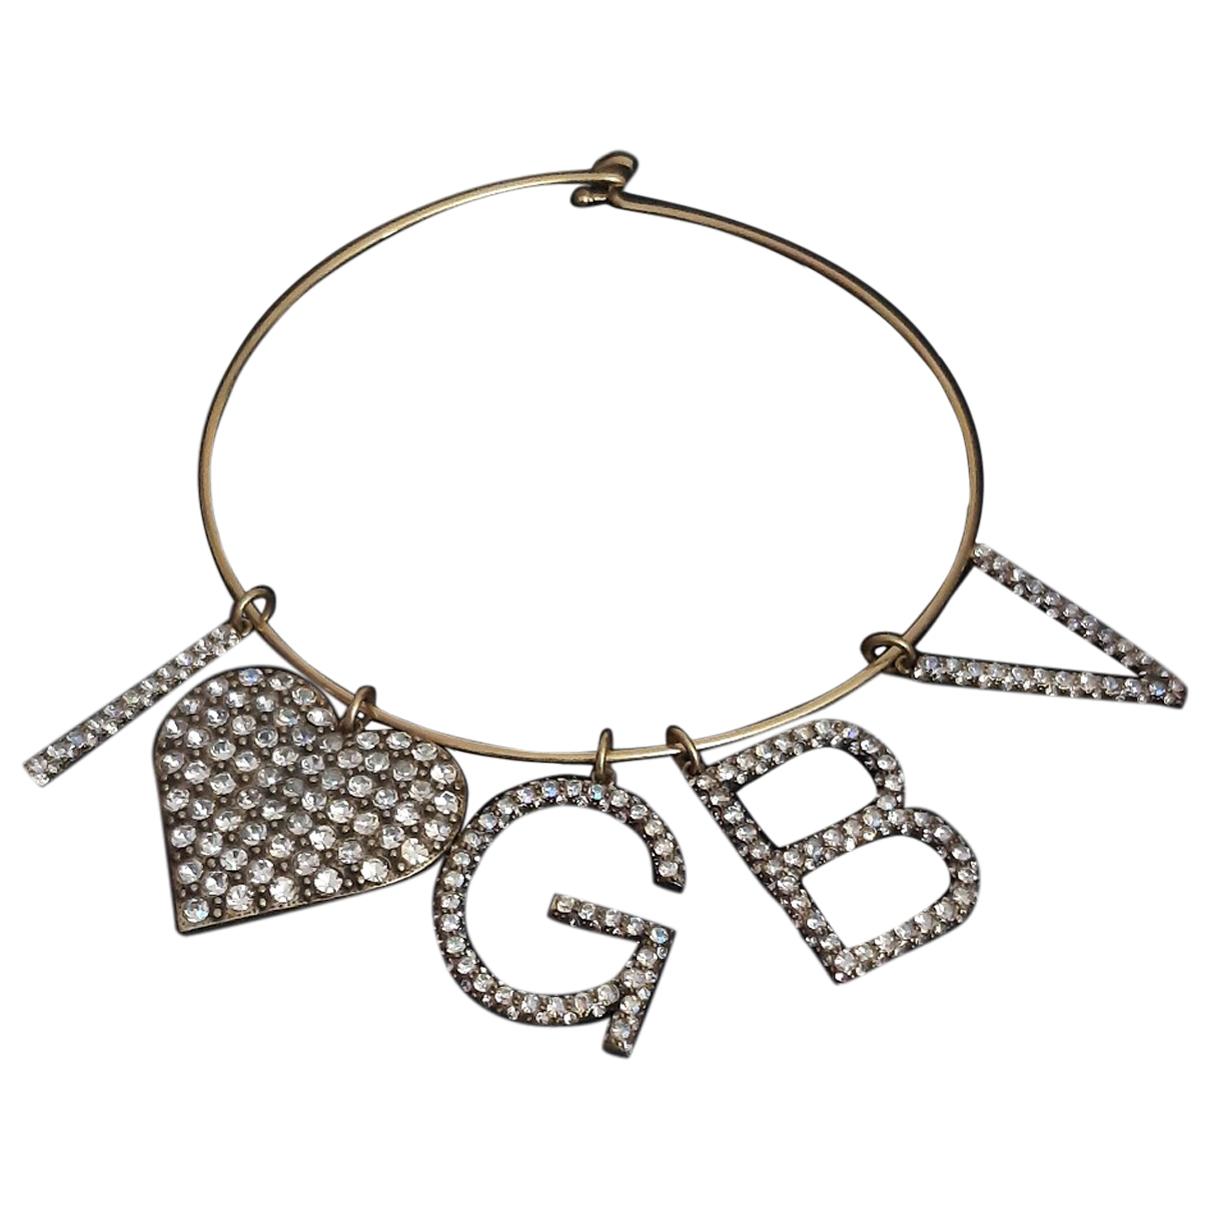 Giambattista Valli X H&m N Gold Metal necklace for Women N